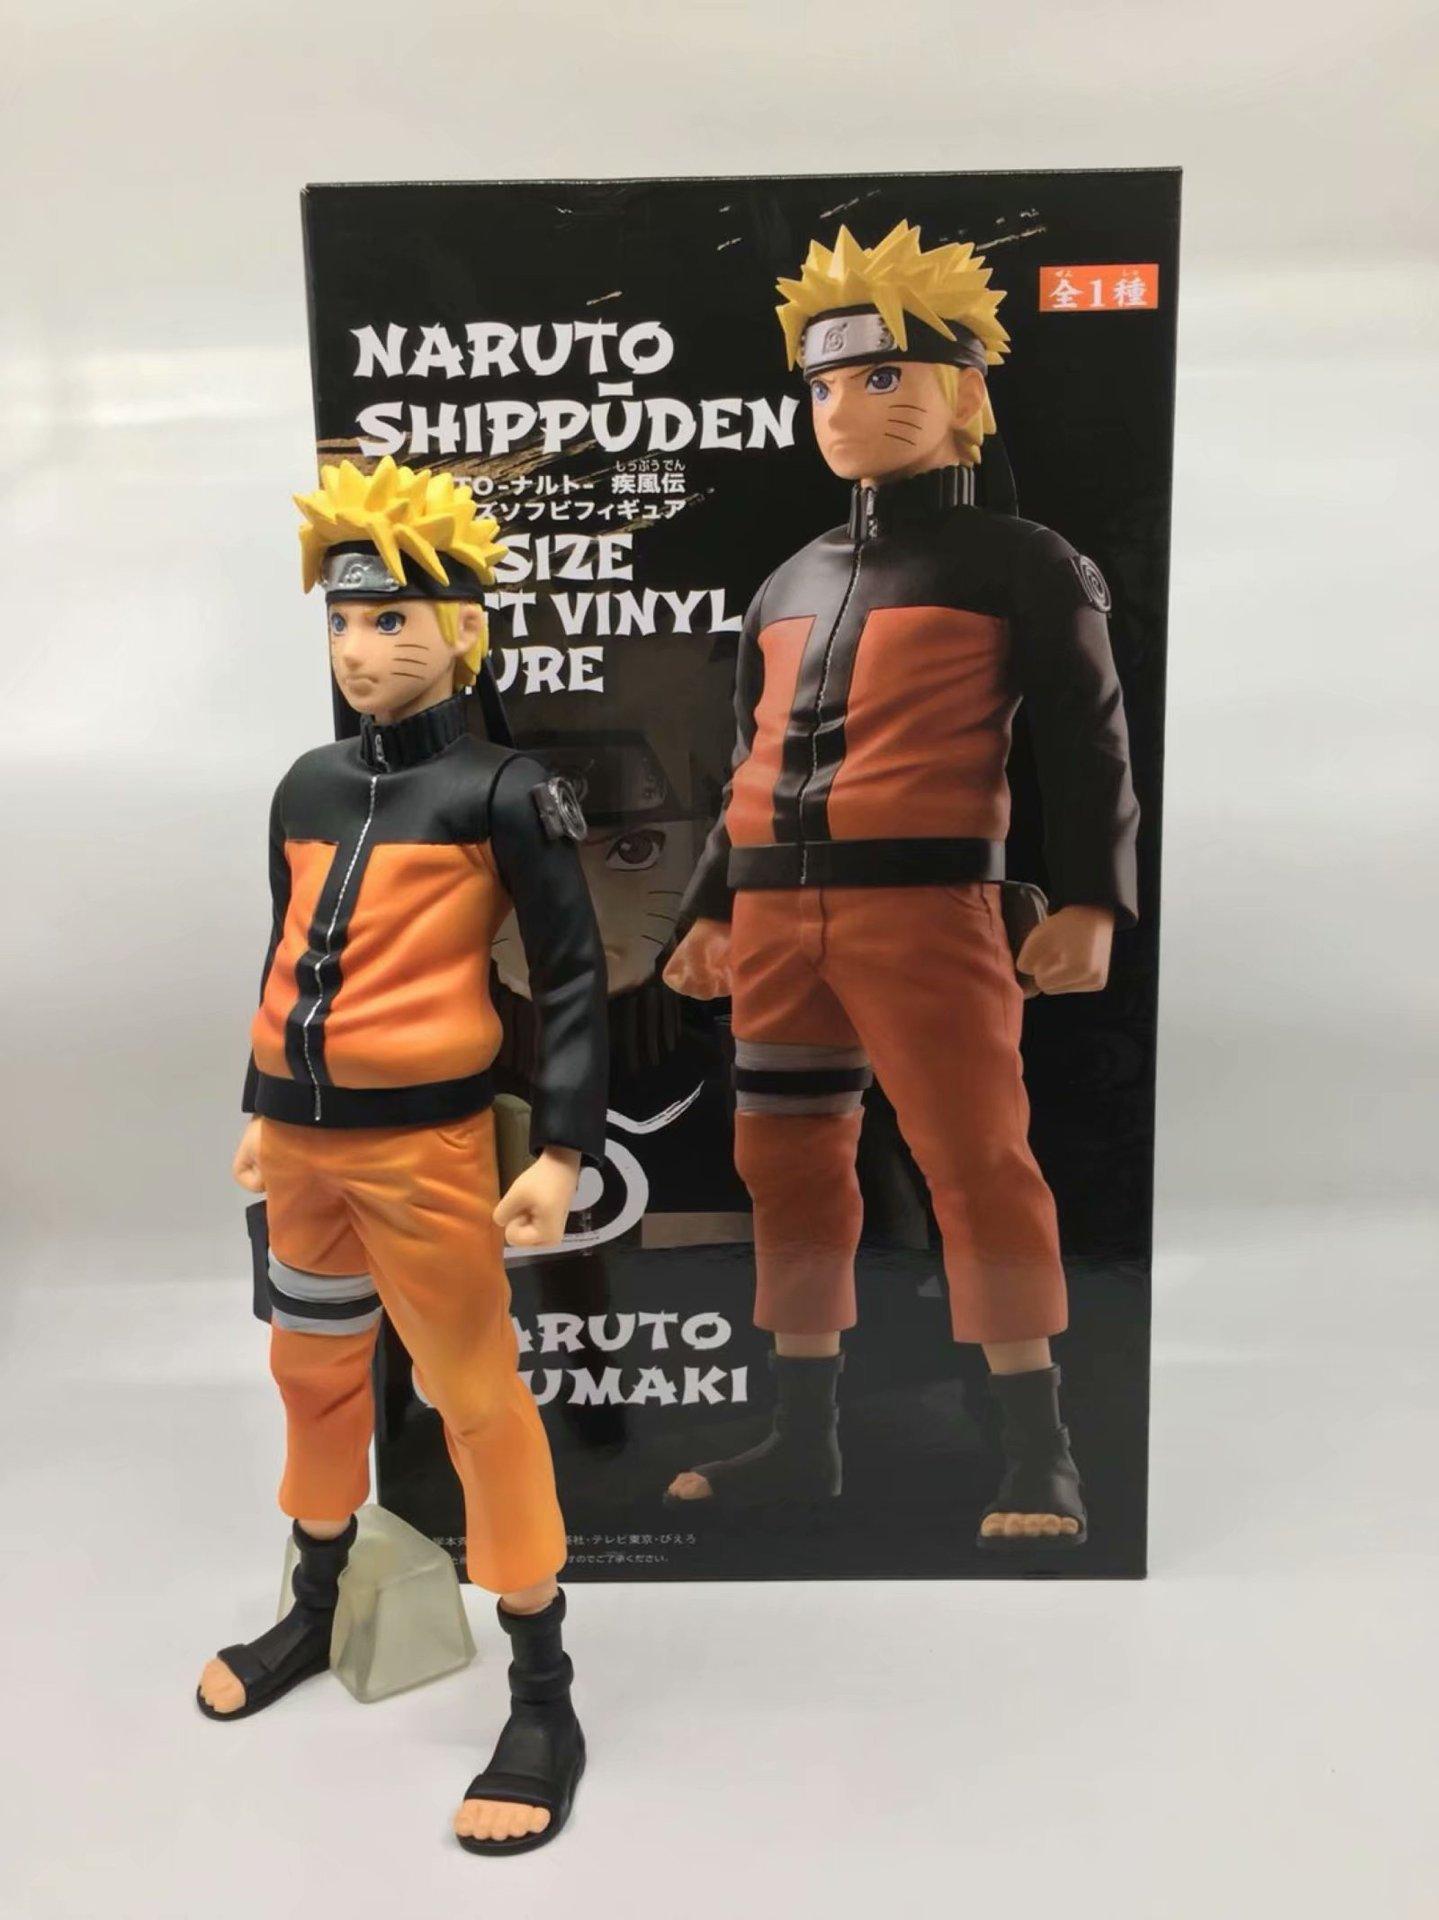 27cm Naruto Shippuden Uzumaki Big Size Soft Figure Model Collection Toys